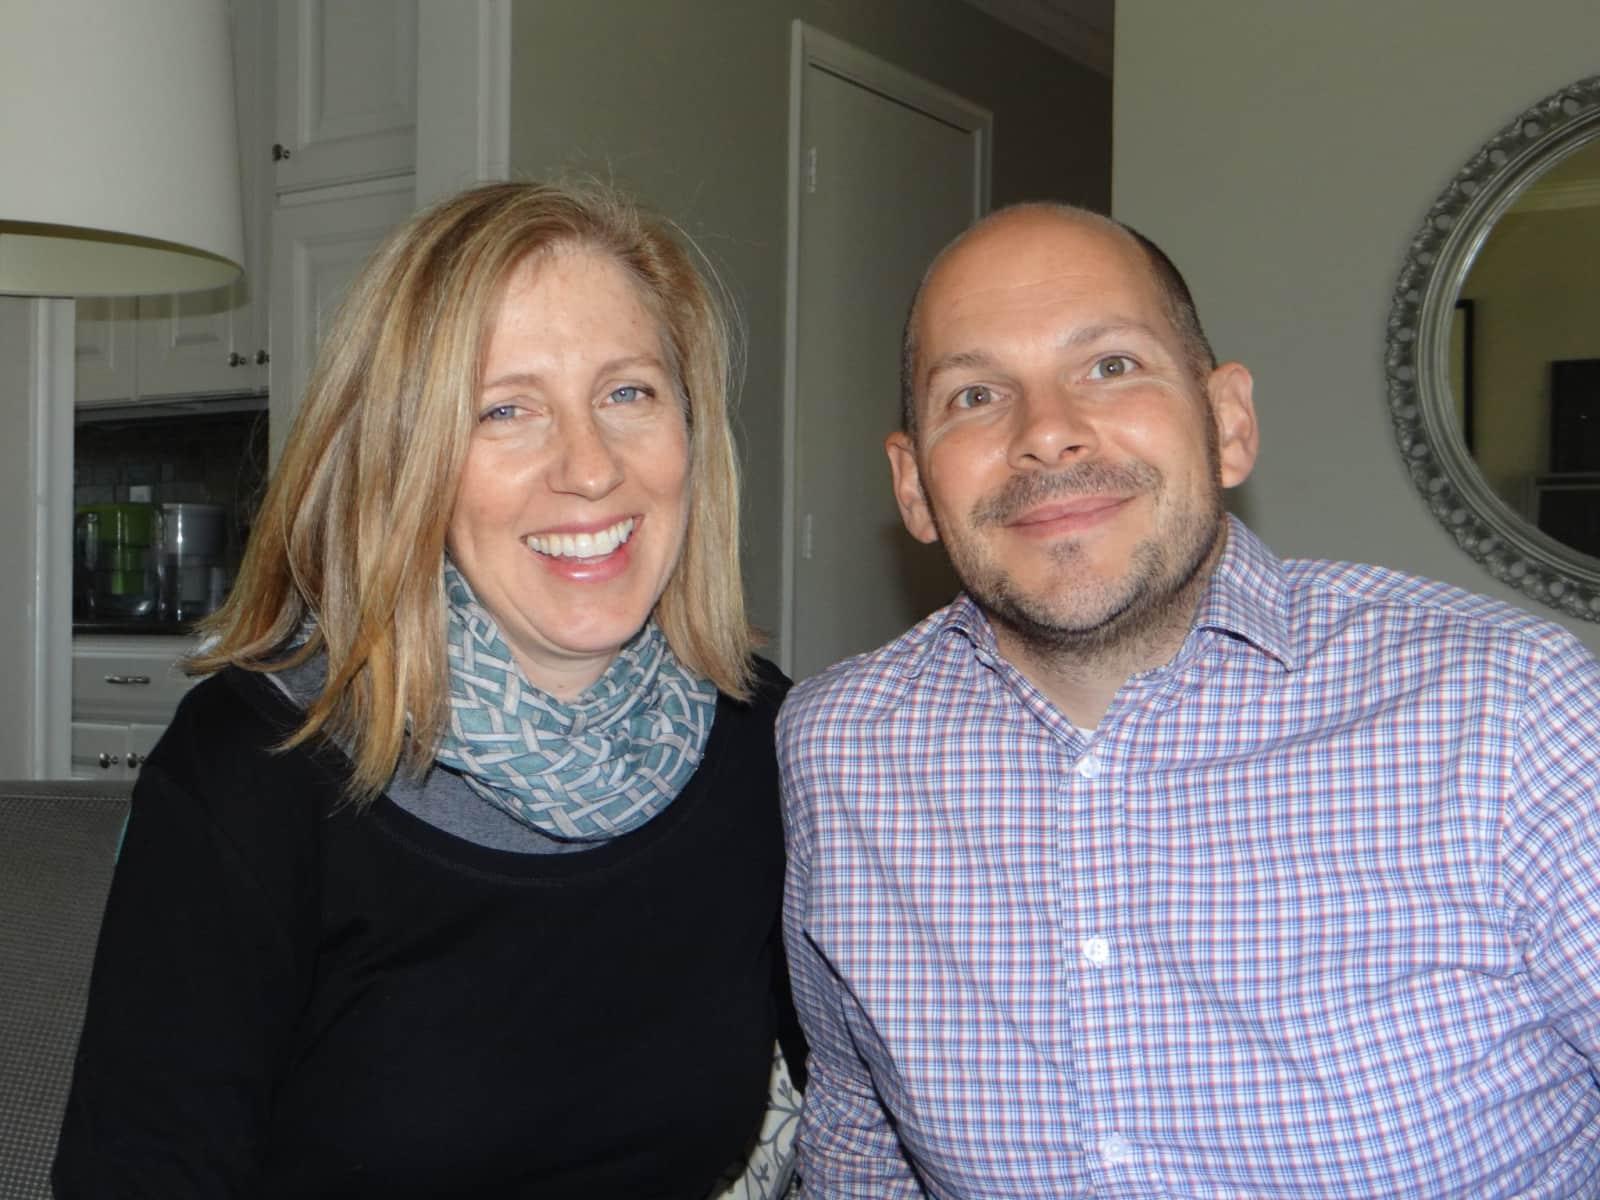 Danielle & Fabien from Minneapolis, Minnesota, United States